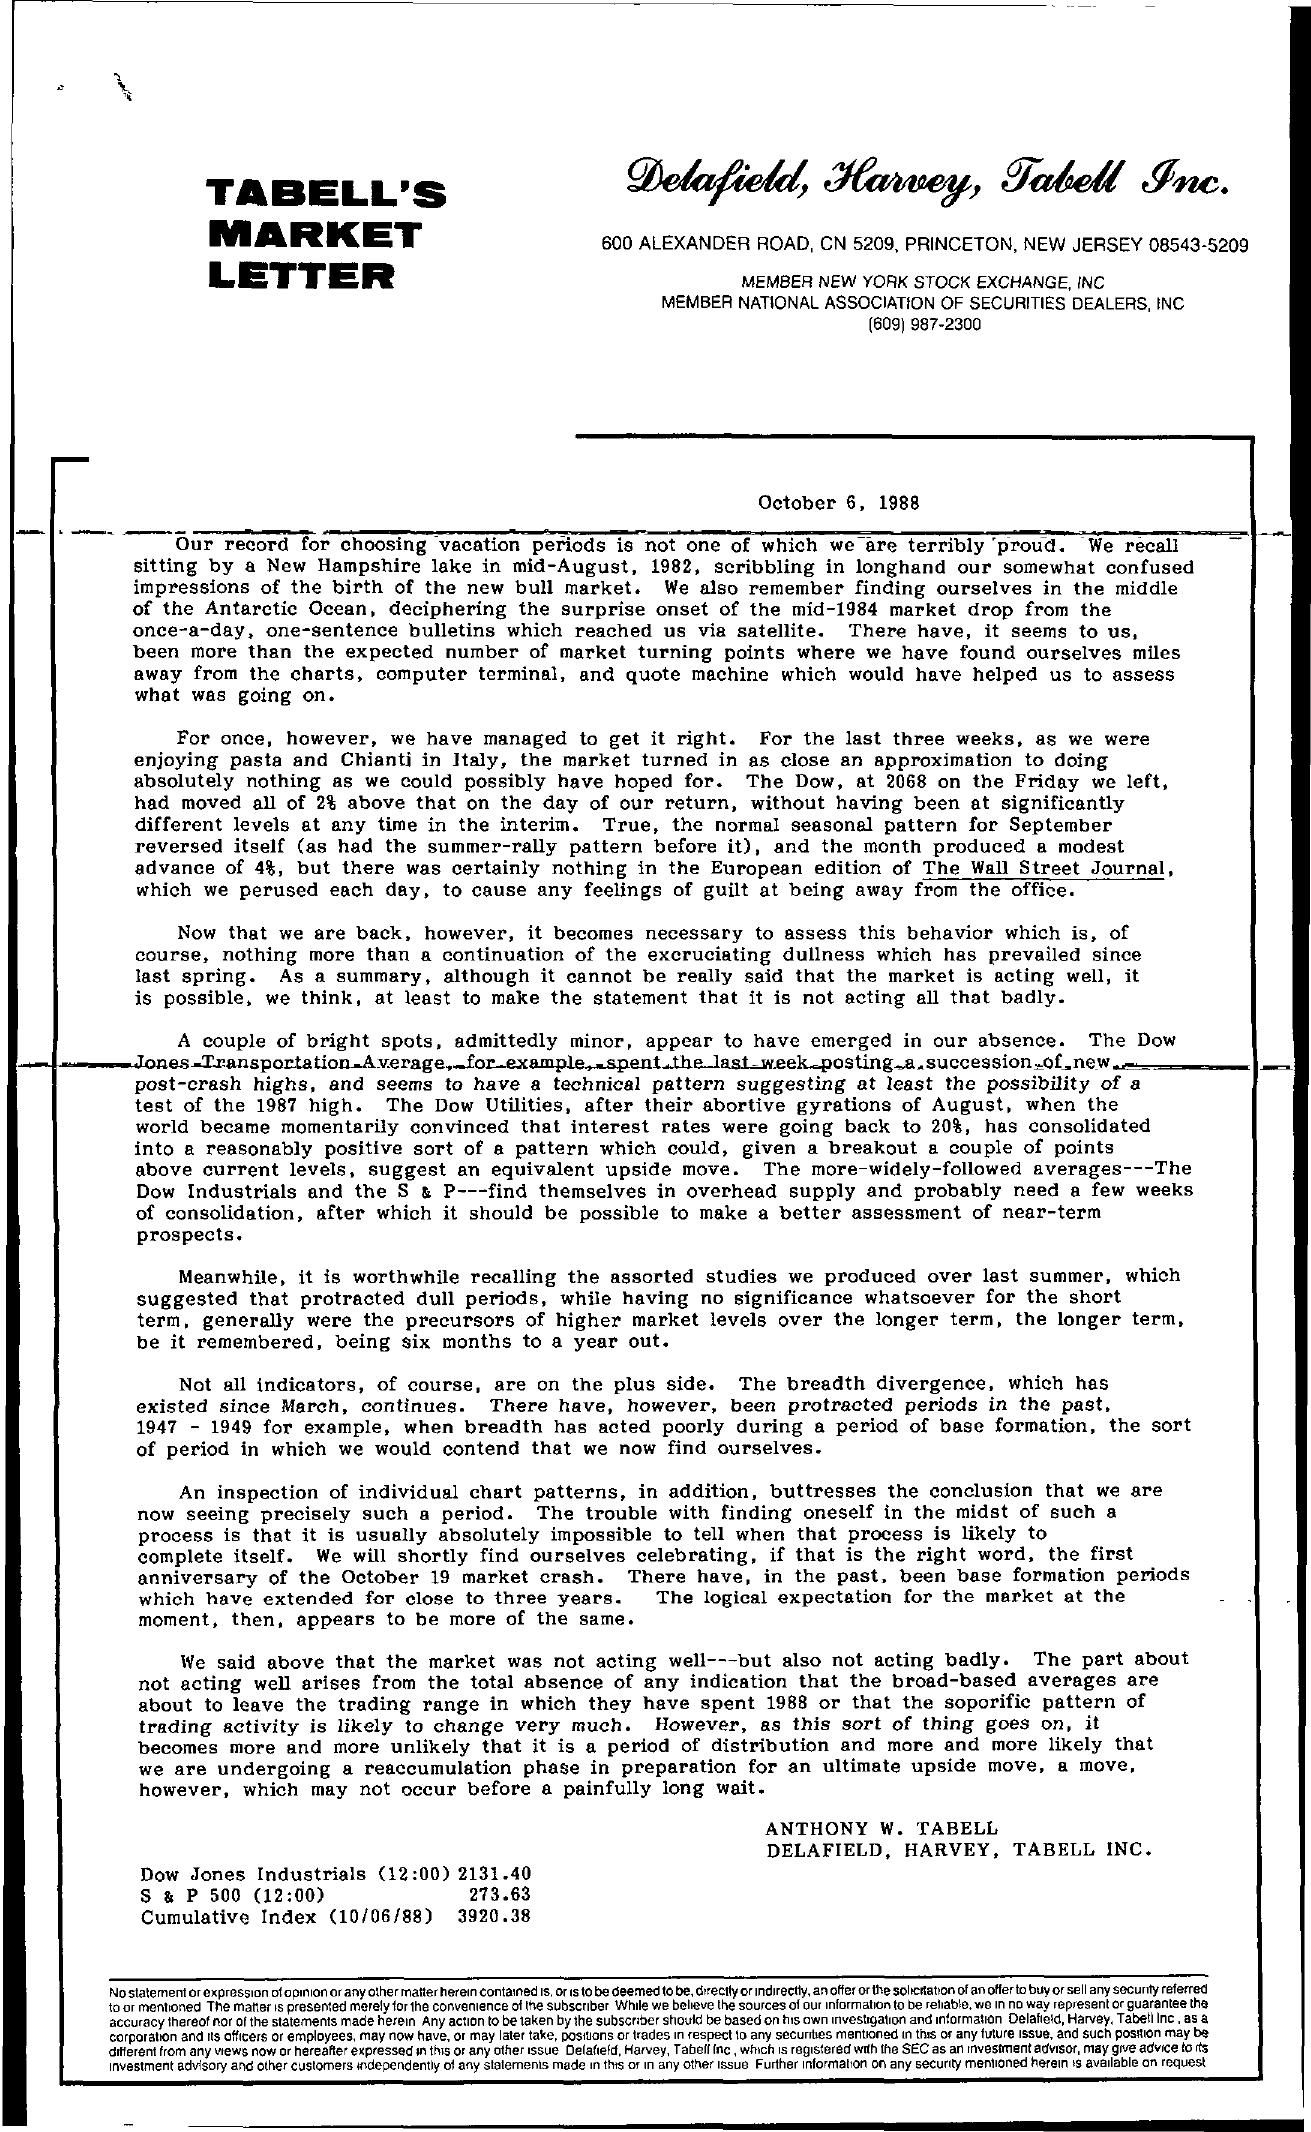 Tabell's Market Letter - October 06, 1988